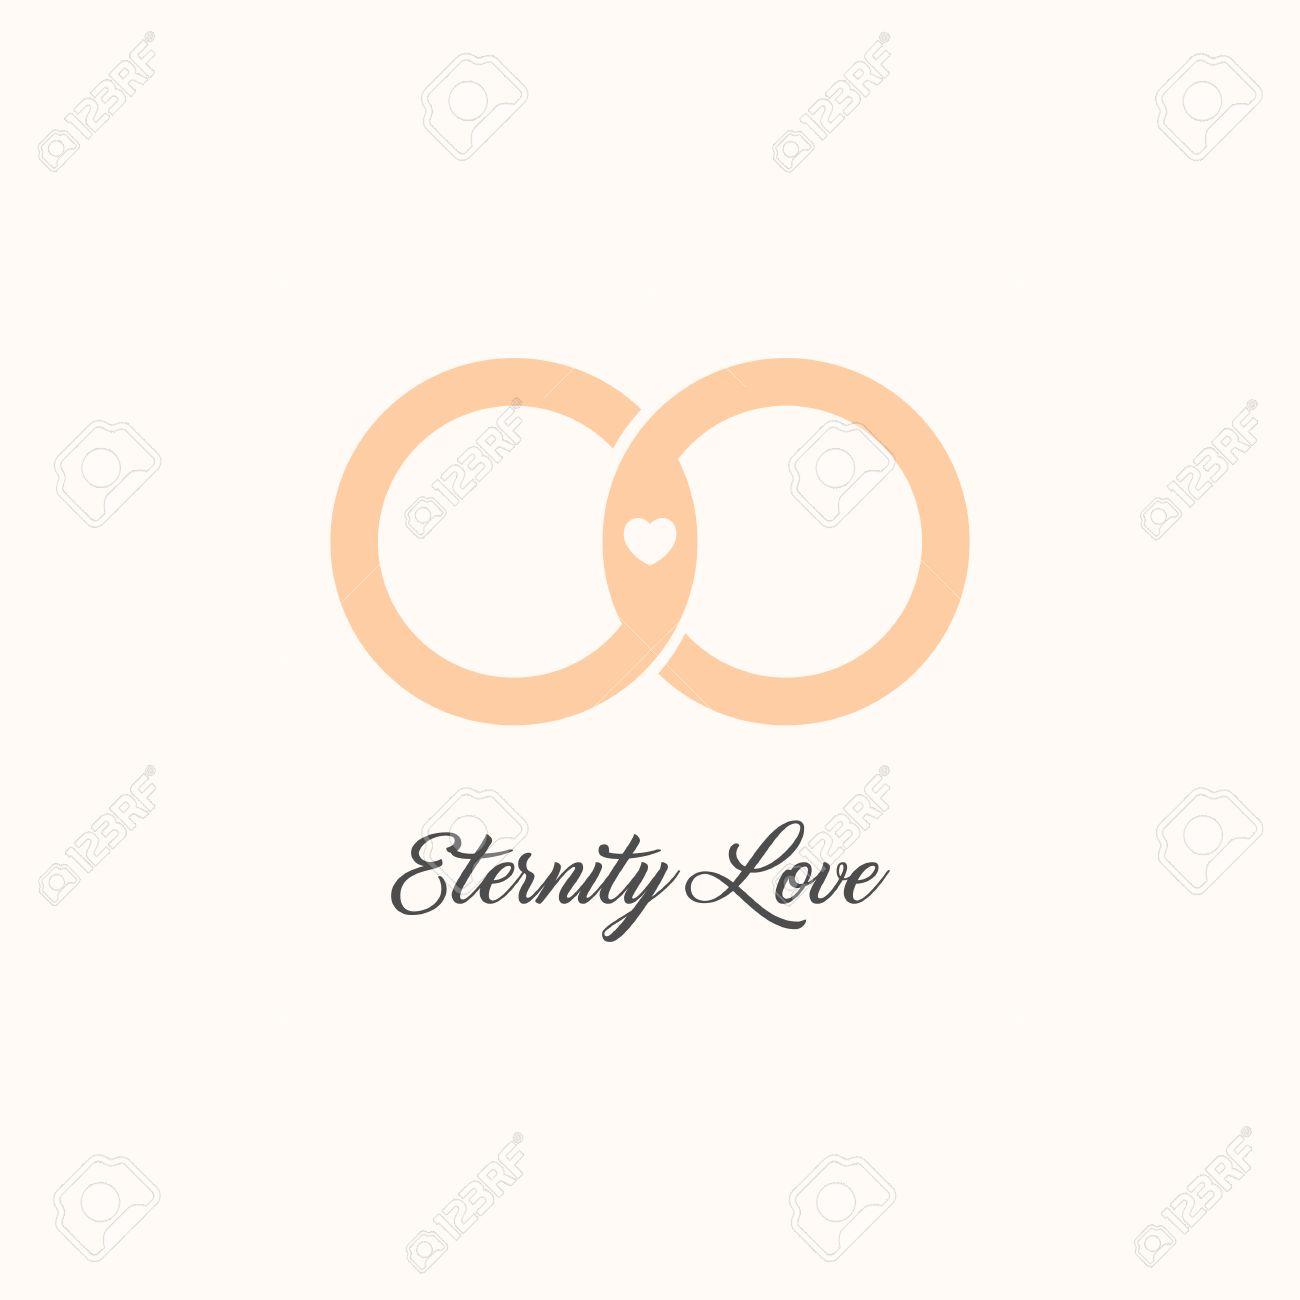 Eternity love vector logo wedding gold rings endless love eternity love vector logo wedding gold rings endless love isolated symbol unusual design biocorpaavc Images